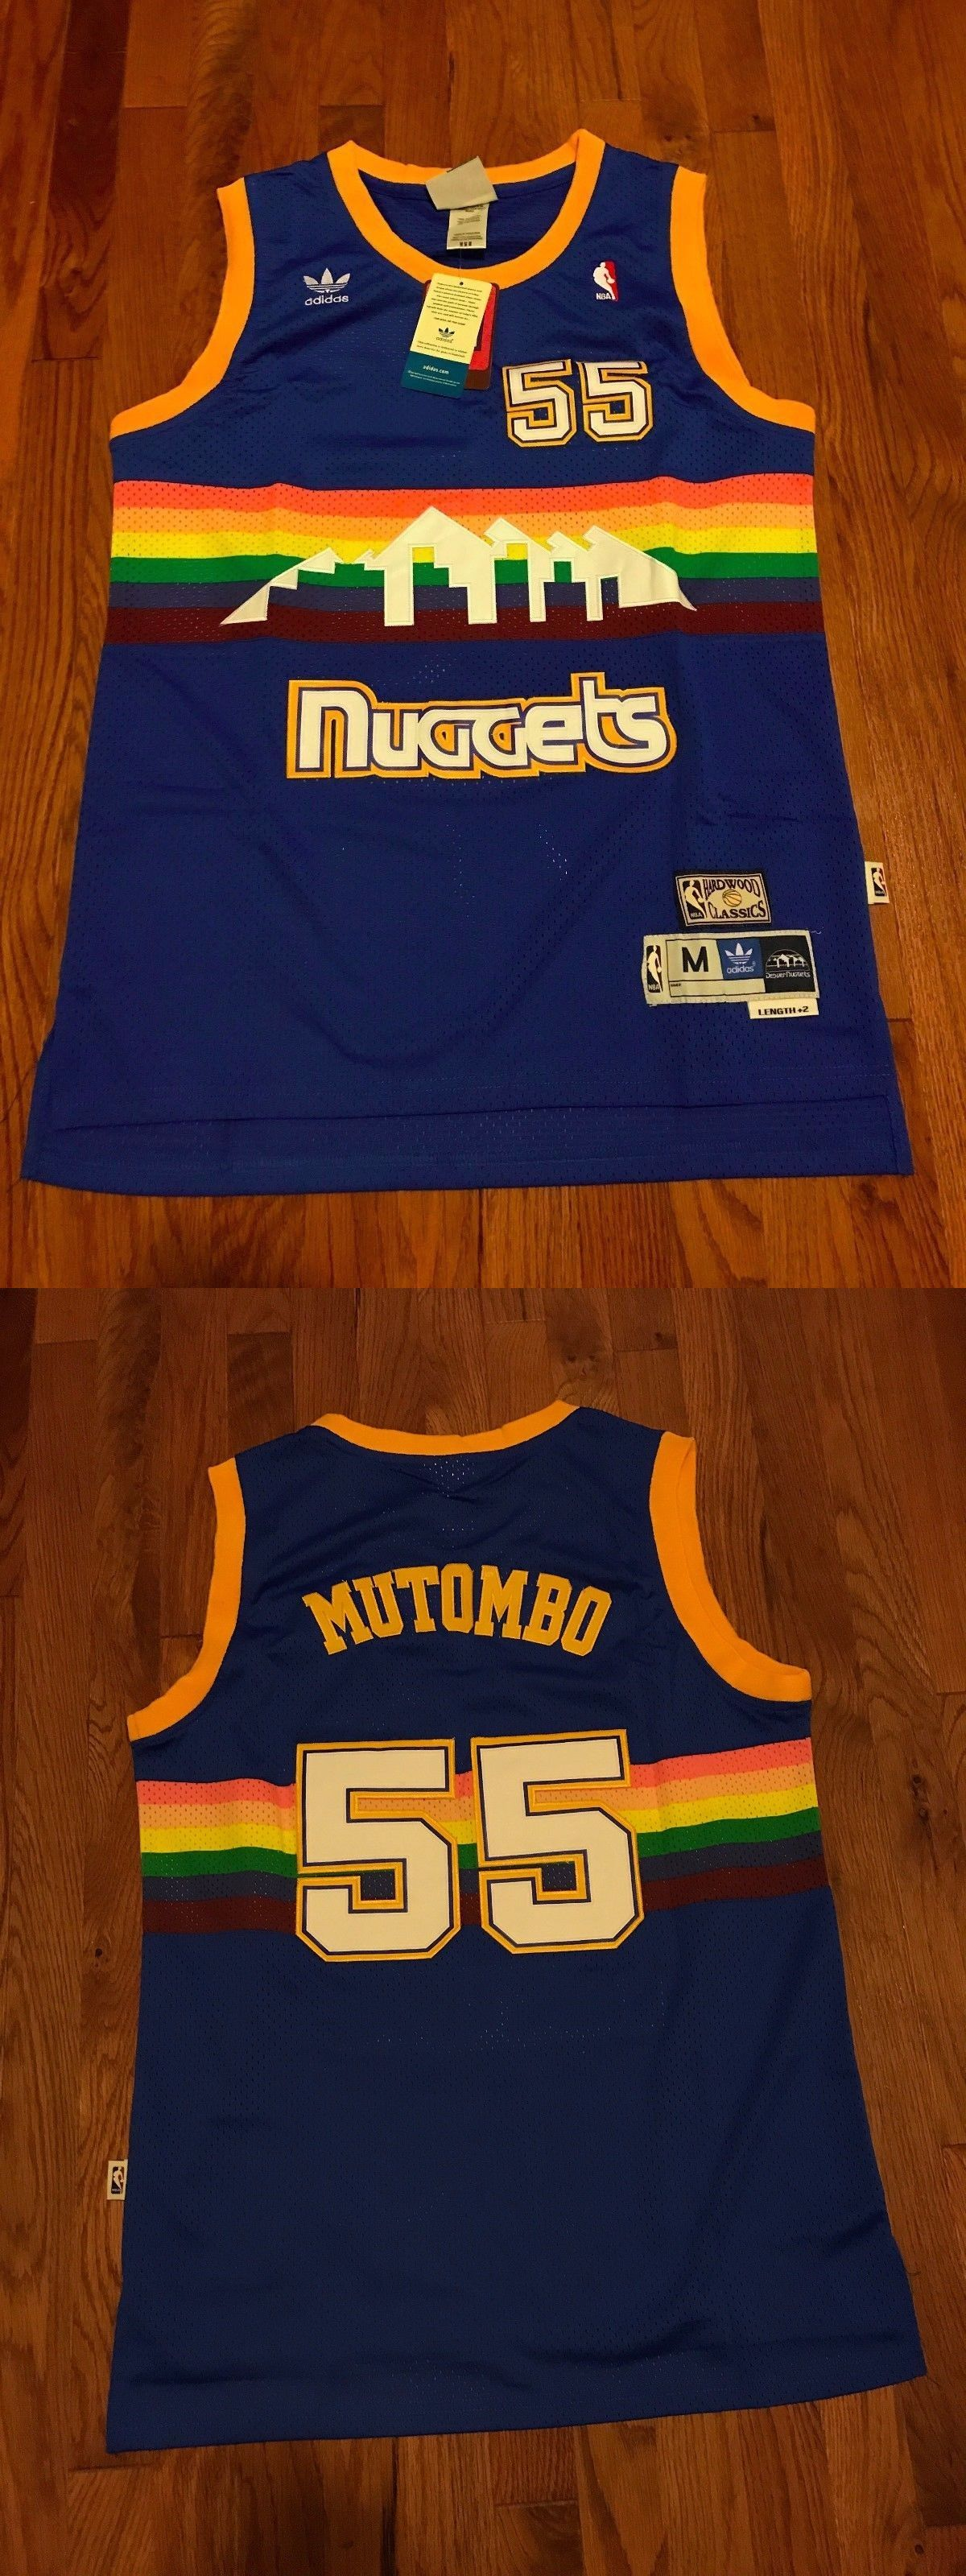 5d5afea1998 Basketball-NBA 24442  Denver Nuggets Dikembe Mutombo No.55 Rainbow  Throwback Swingman Jersey